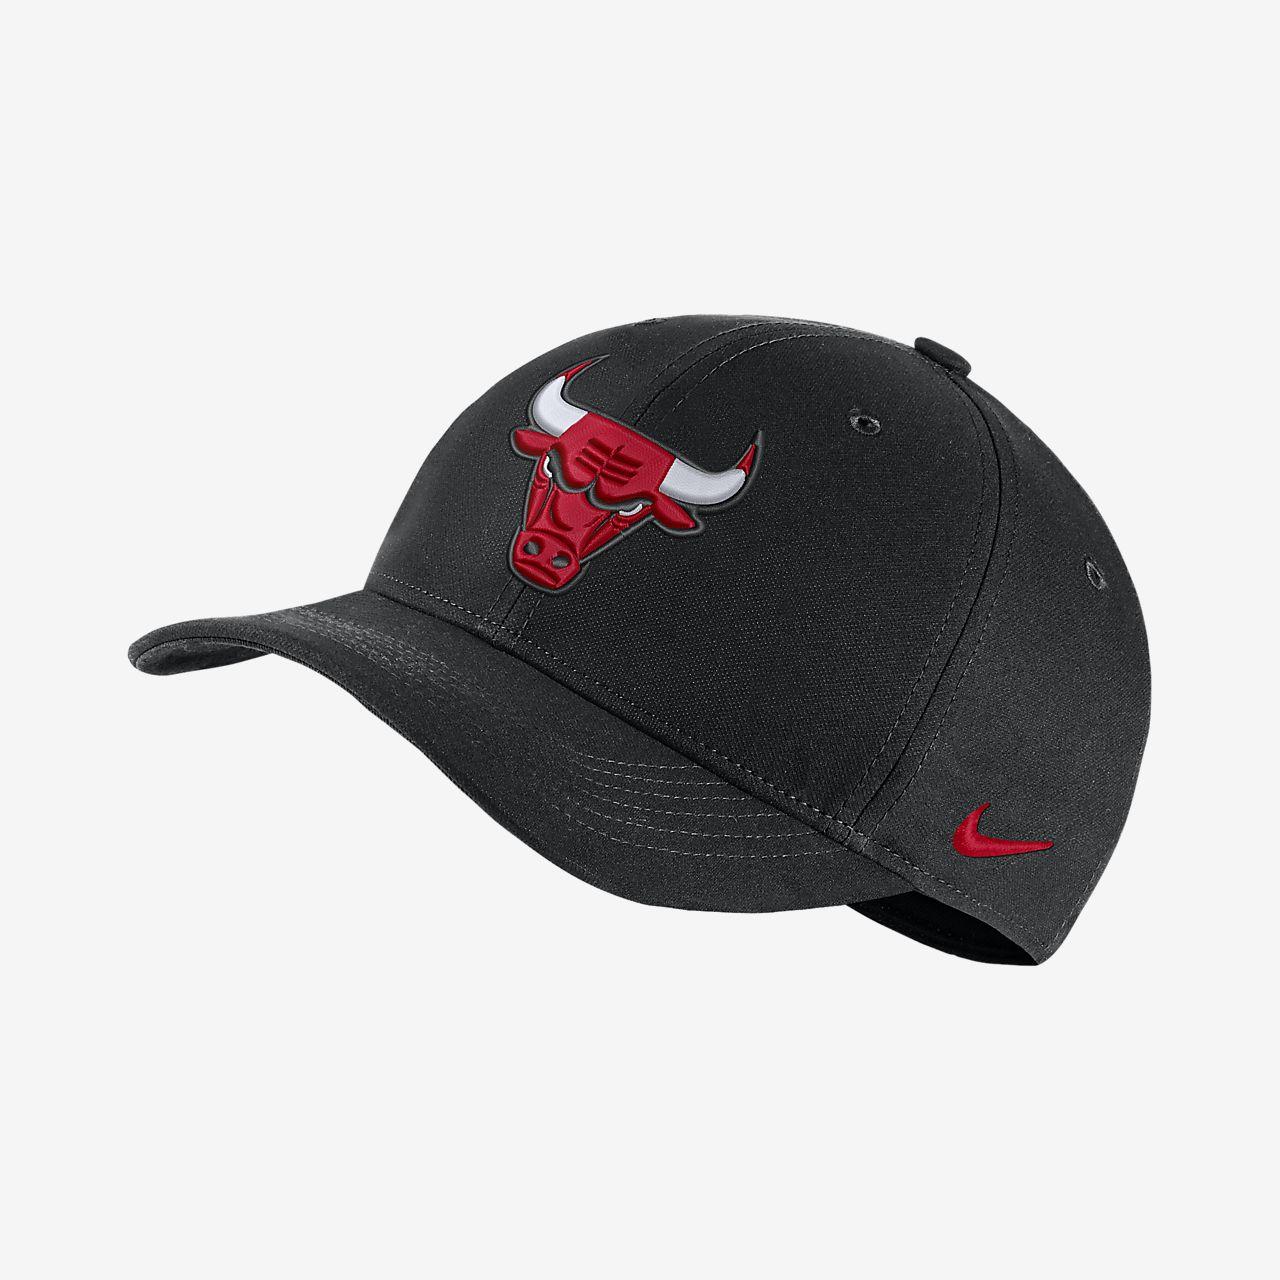 7b58570ae2779 Chicago Bulls City Edition Nike AeroBill Classic99 NBA Hat. Nike.com IN